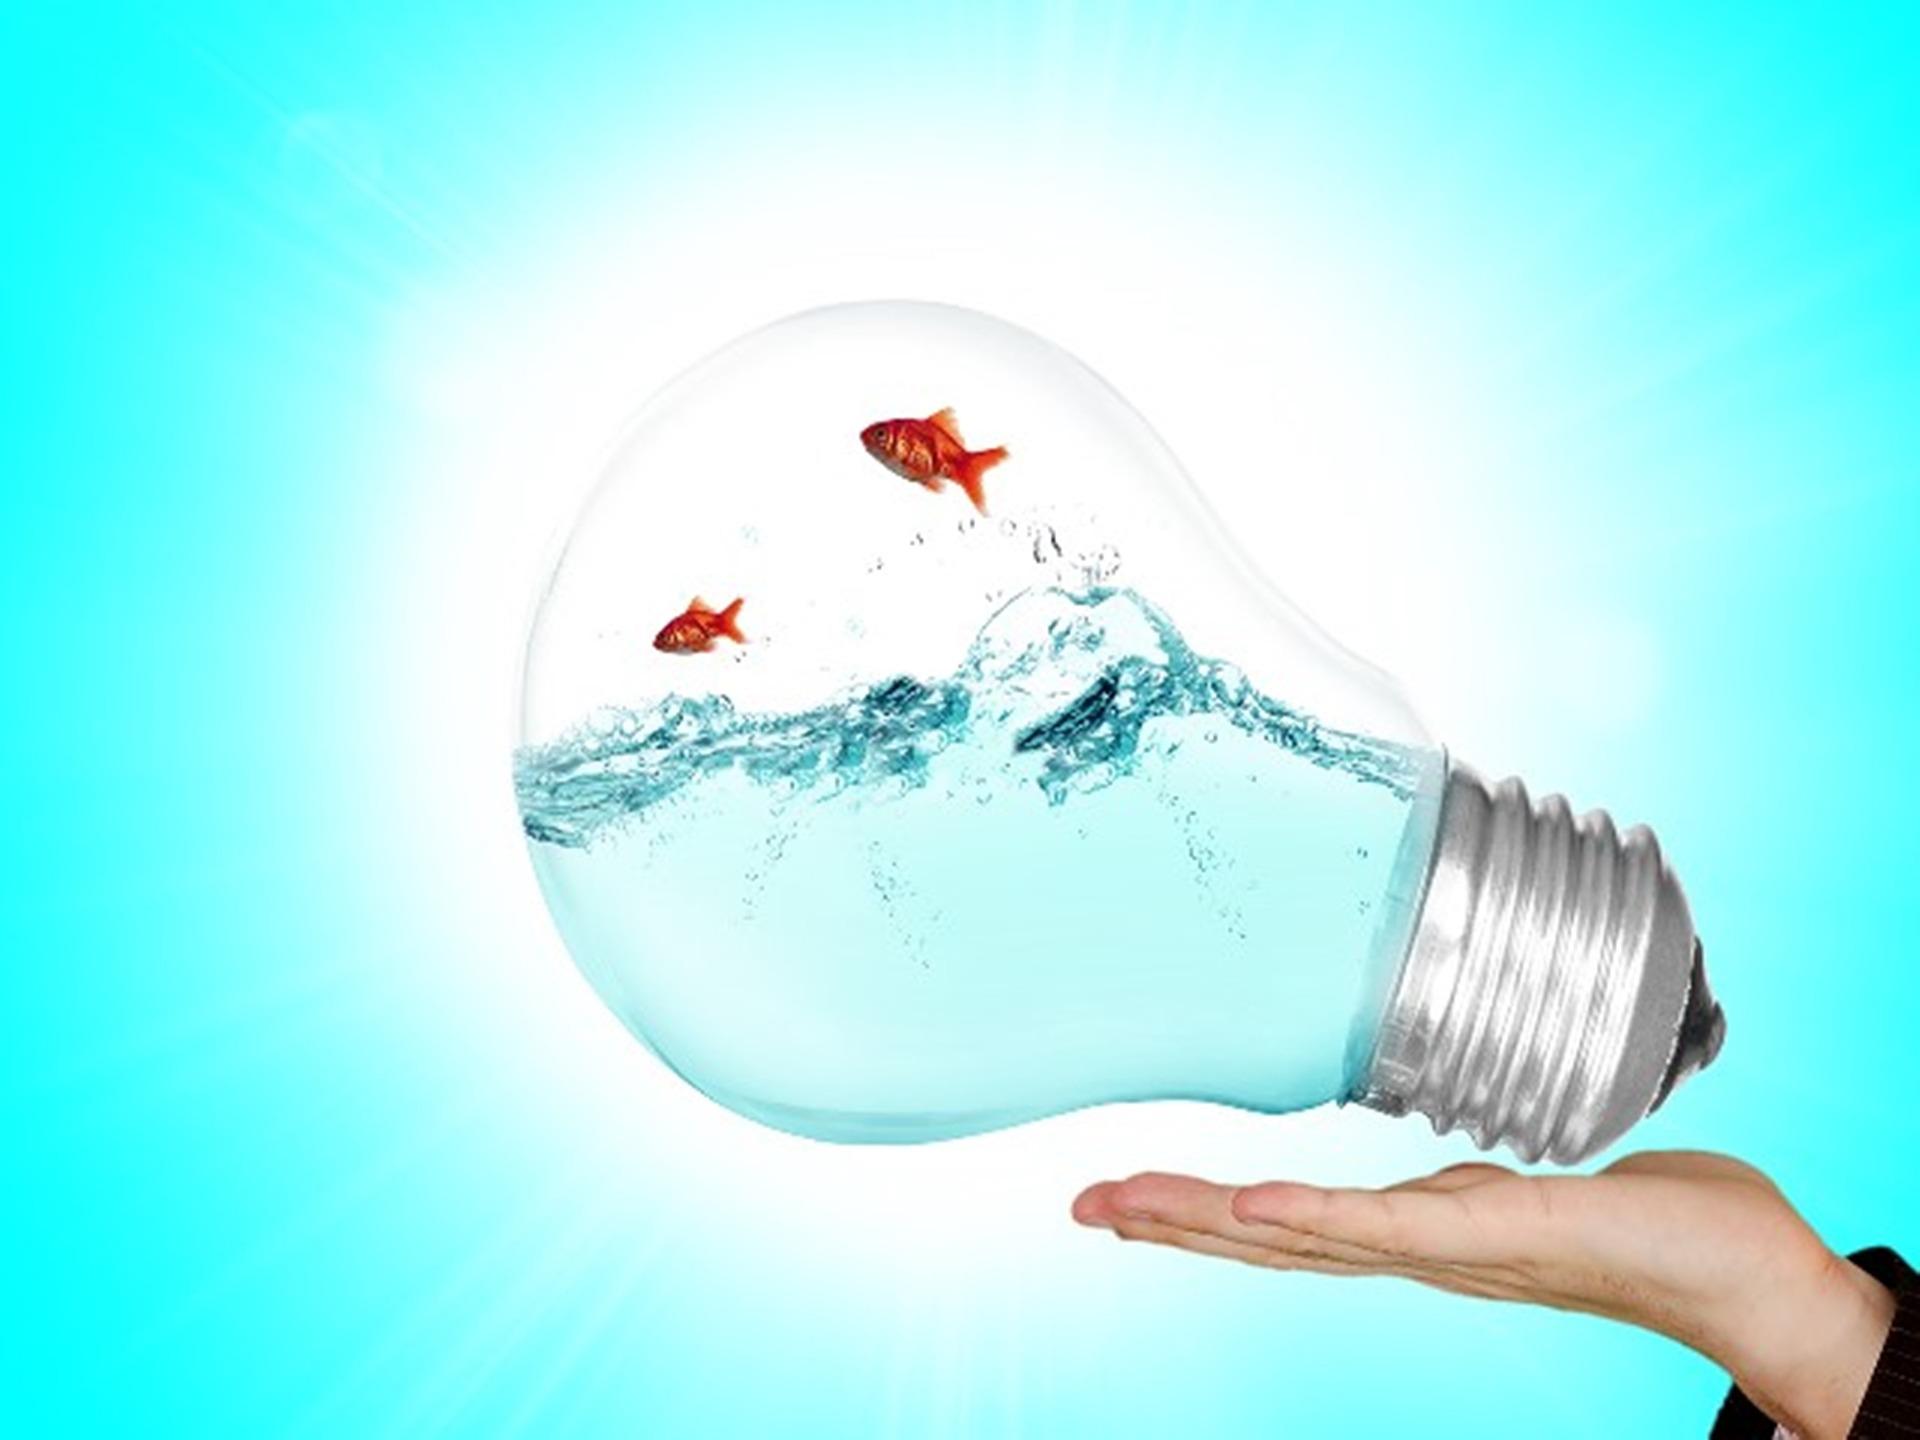 lamp-2247538_1920_Mari Ana_Pixabay